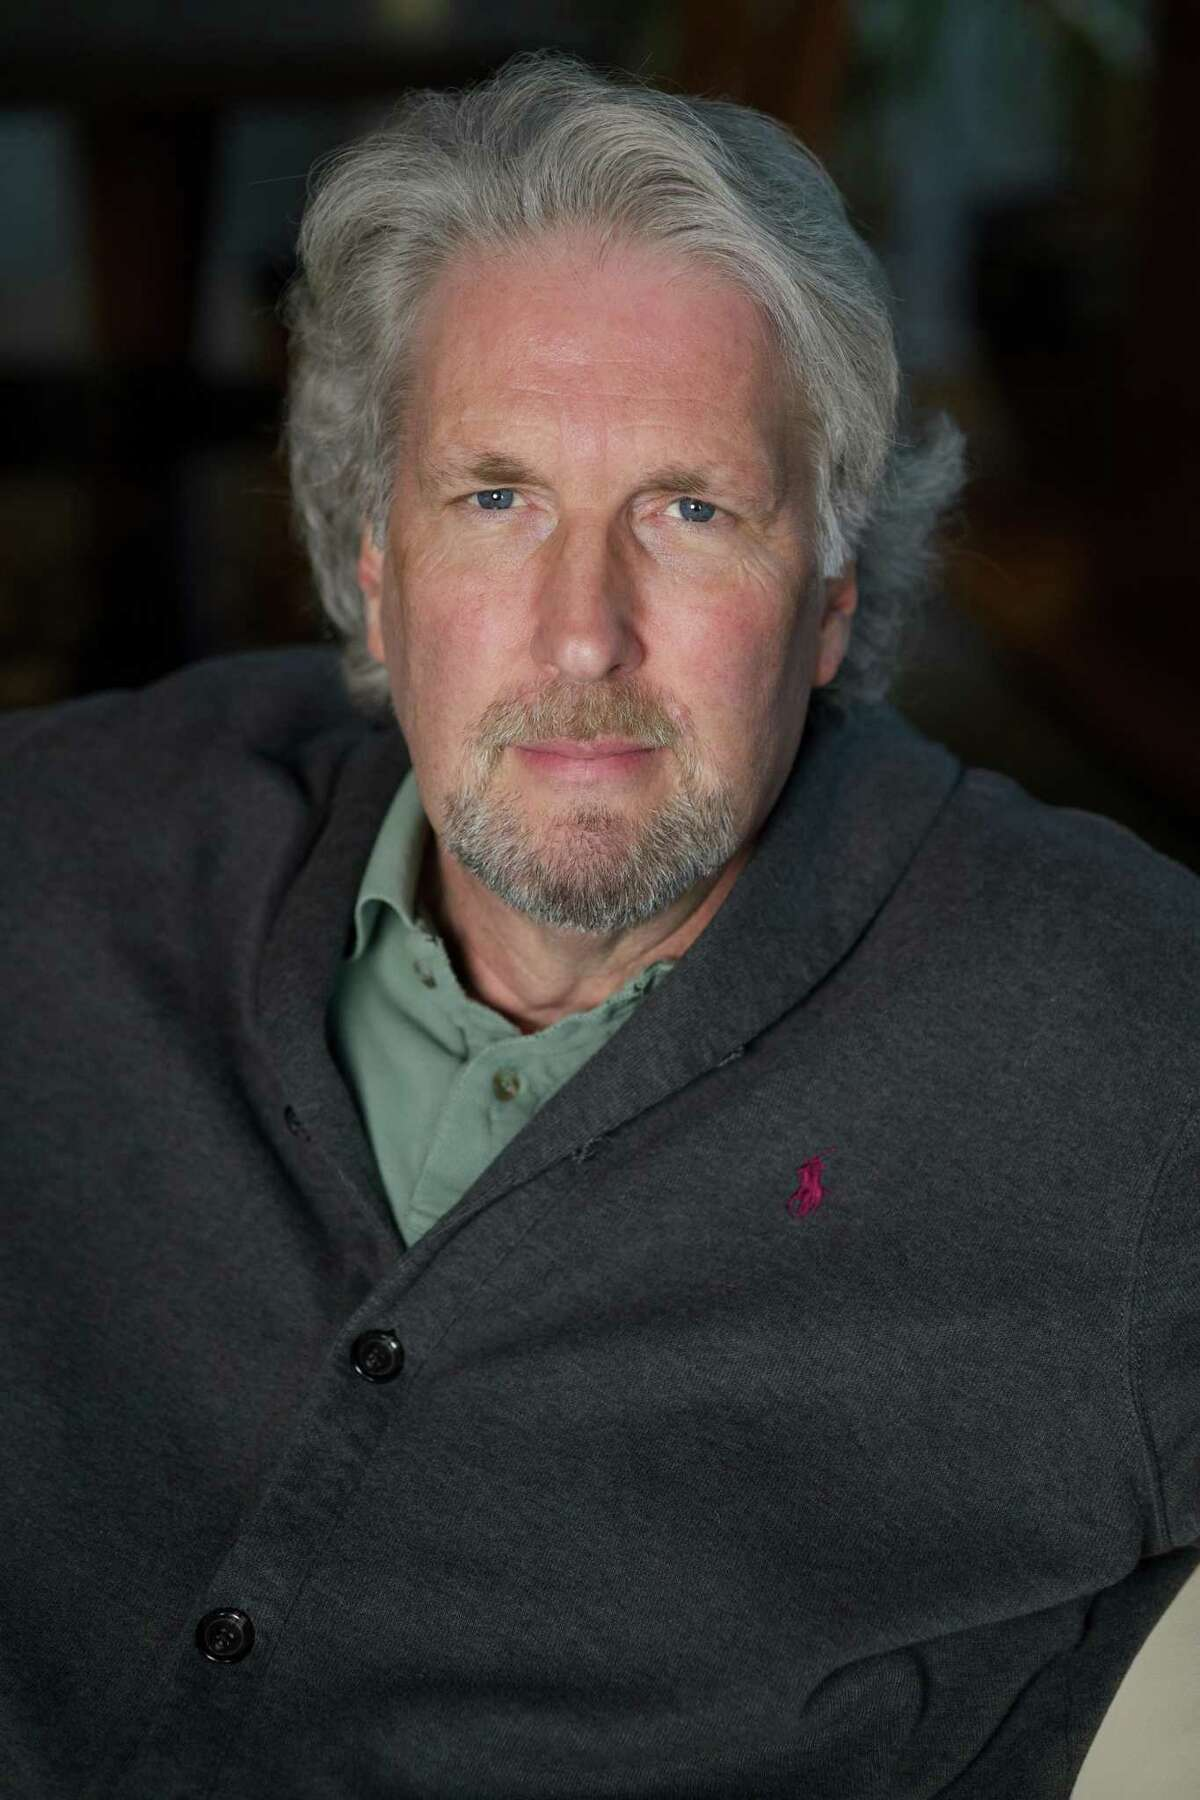 New Haven filmmaker Steve Hamm